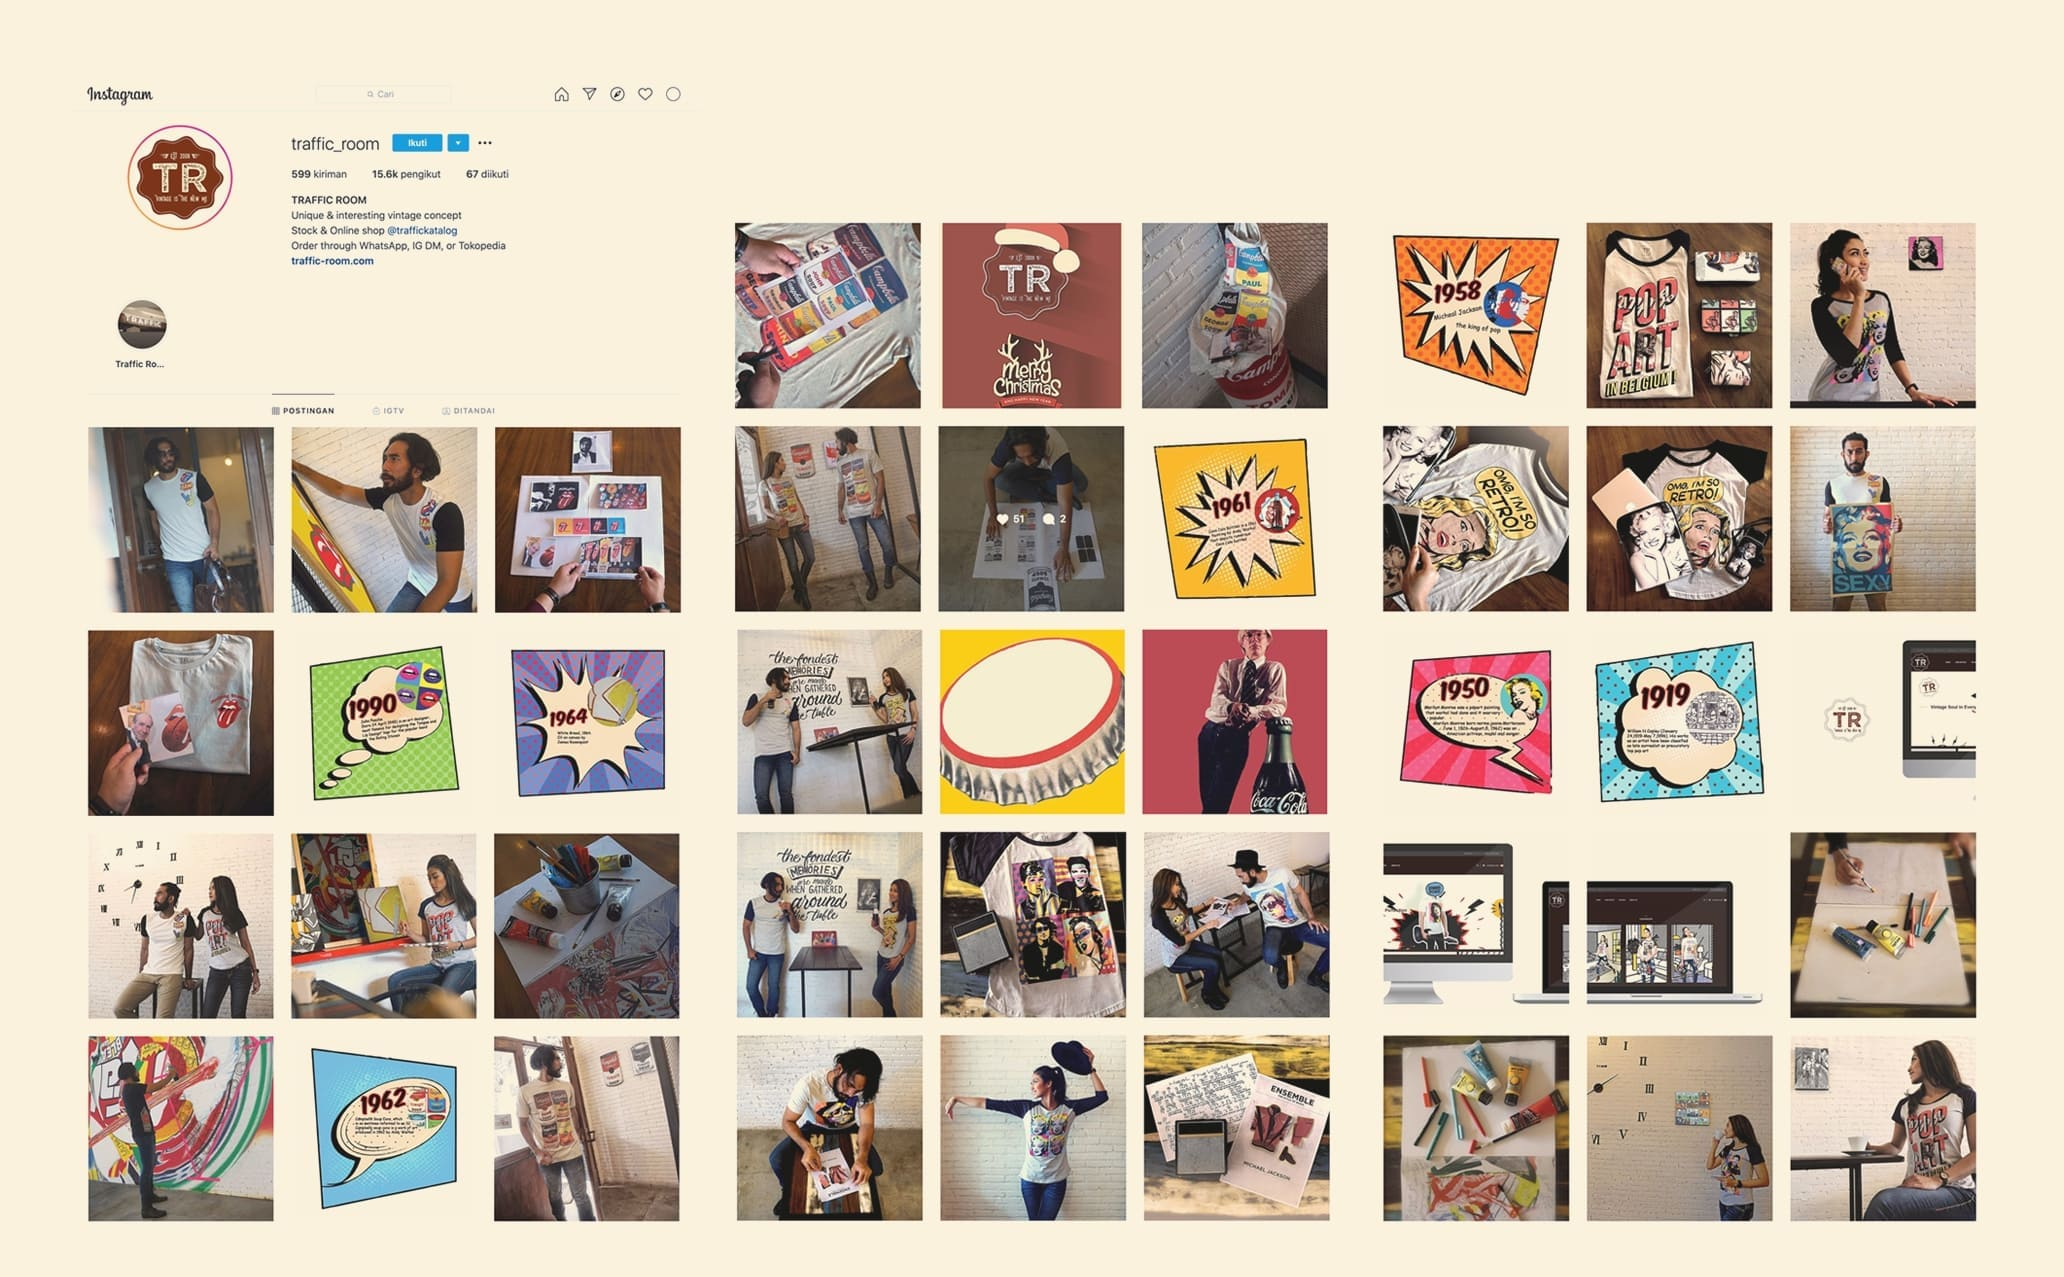 branding traffict room by sws digital agency